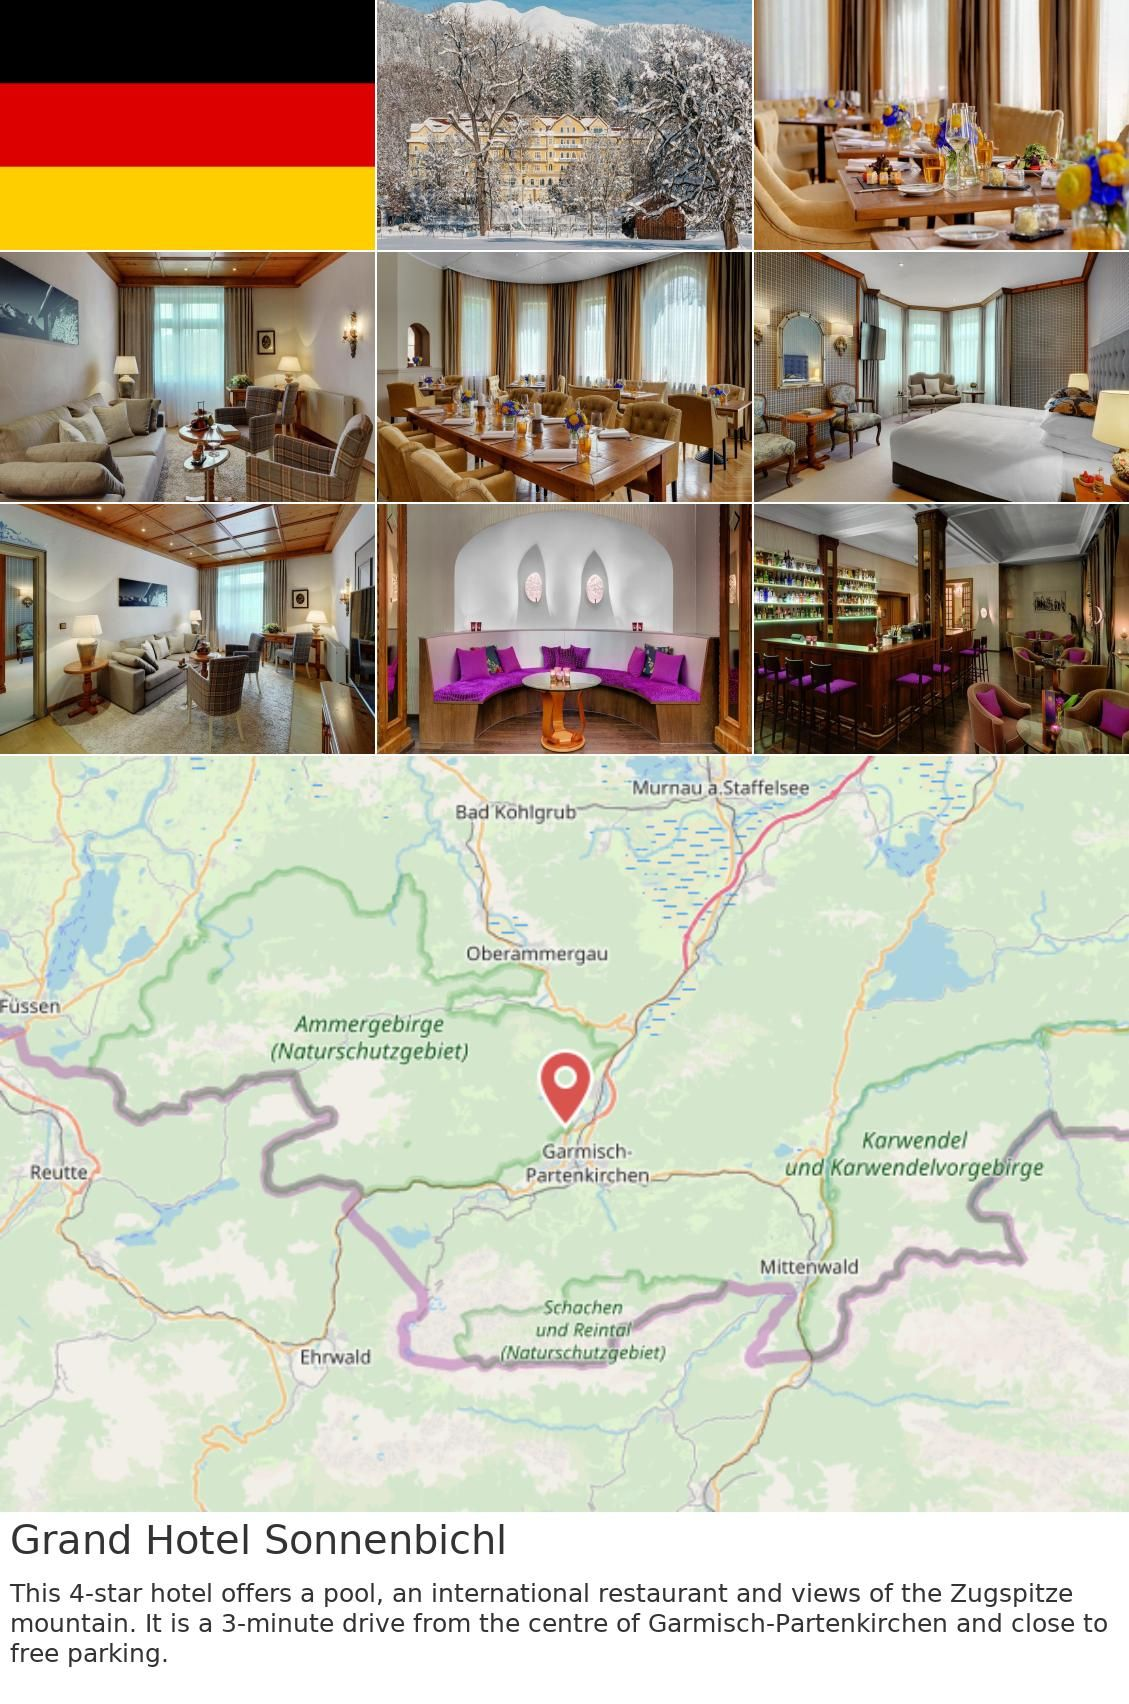 Europe Germany Garmisch Partenkirchen Grand Hotel Sonnenbichl This 4 Star Hotel Offers A Pool An International Restaurant And Views Of The Zugspitze Mounta